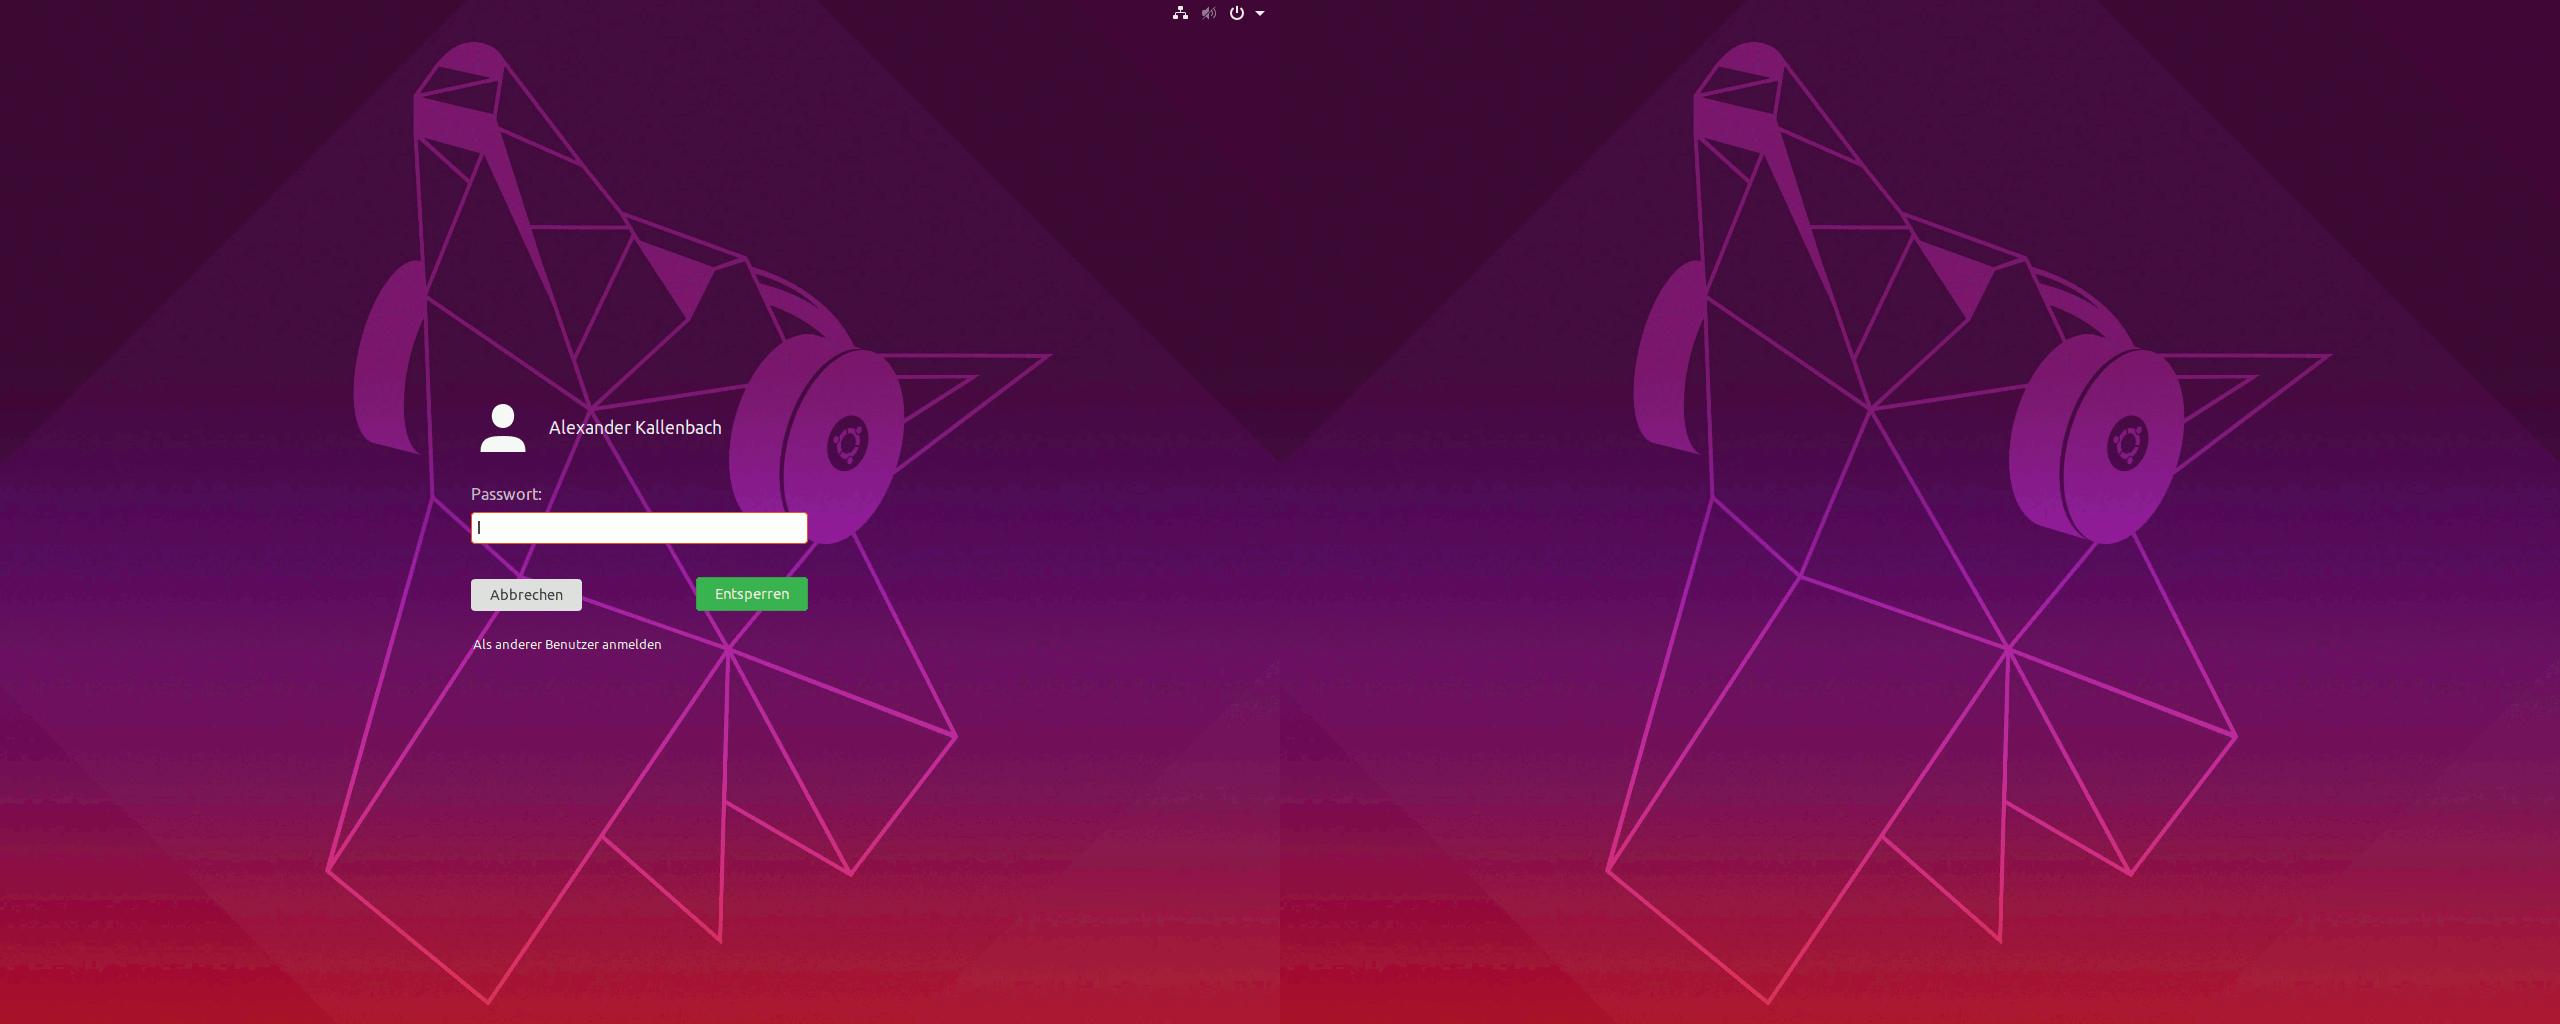 GDM-Login-Screen: Eigenes Hintergrundbild auf zwei Monitoren  